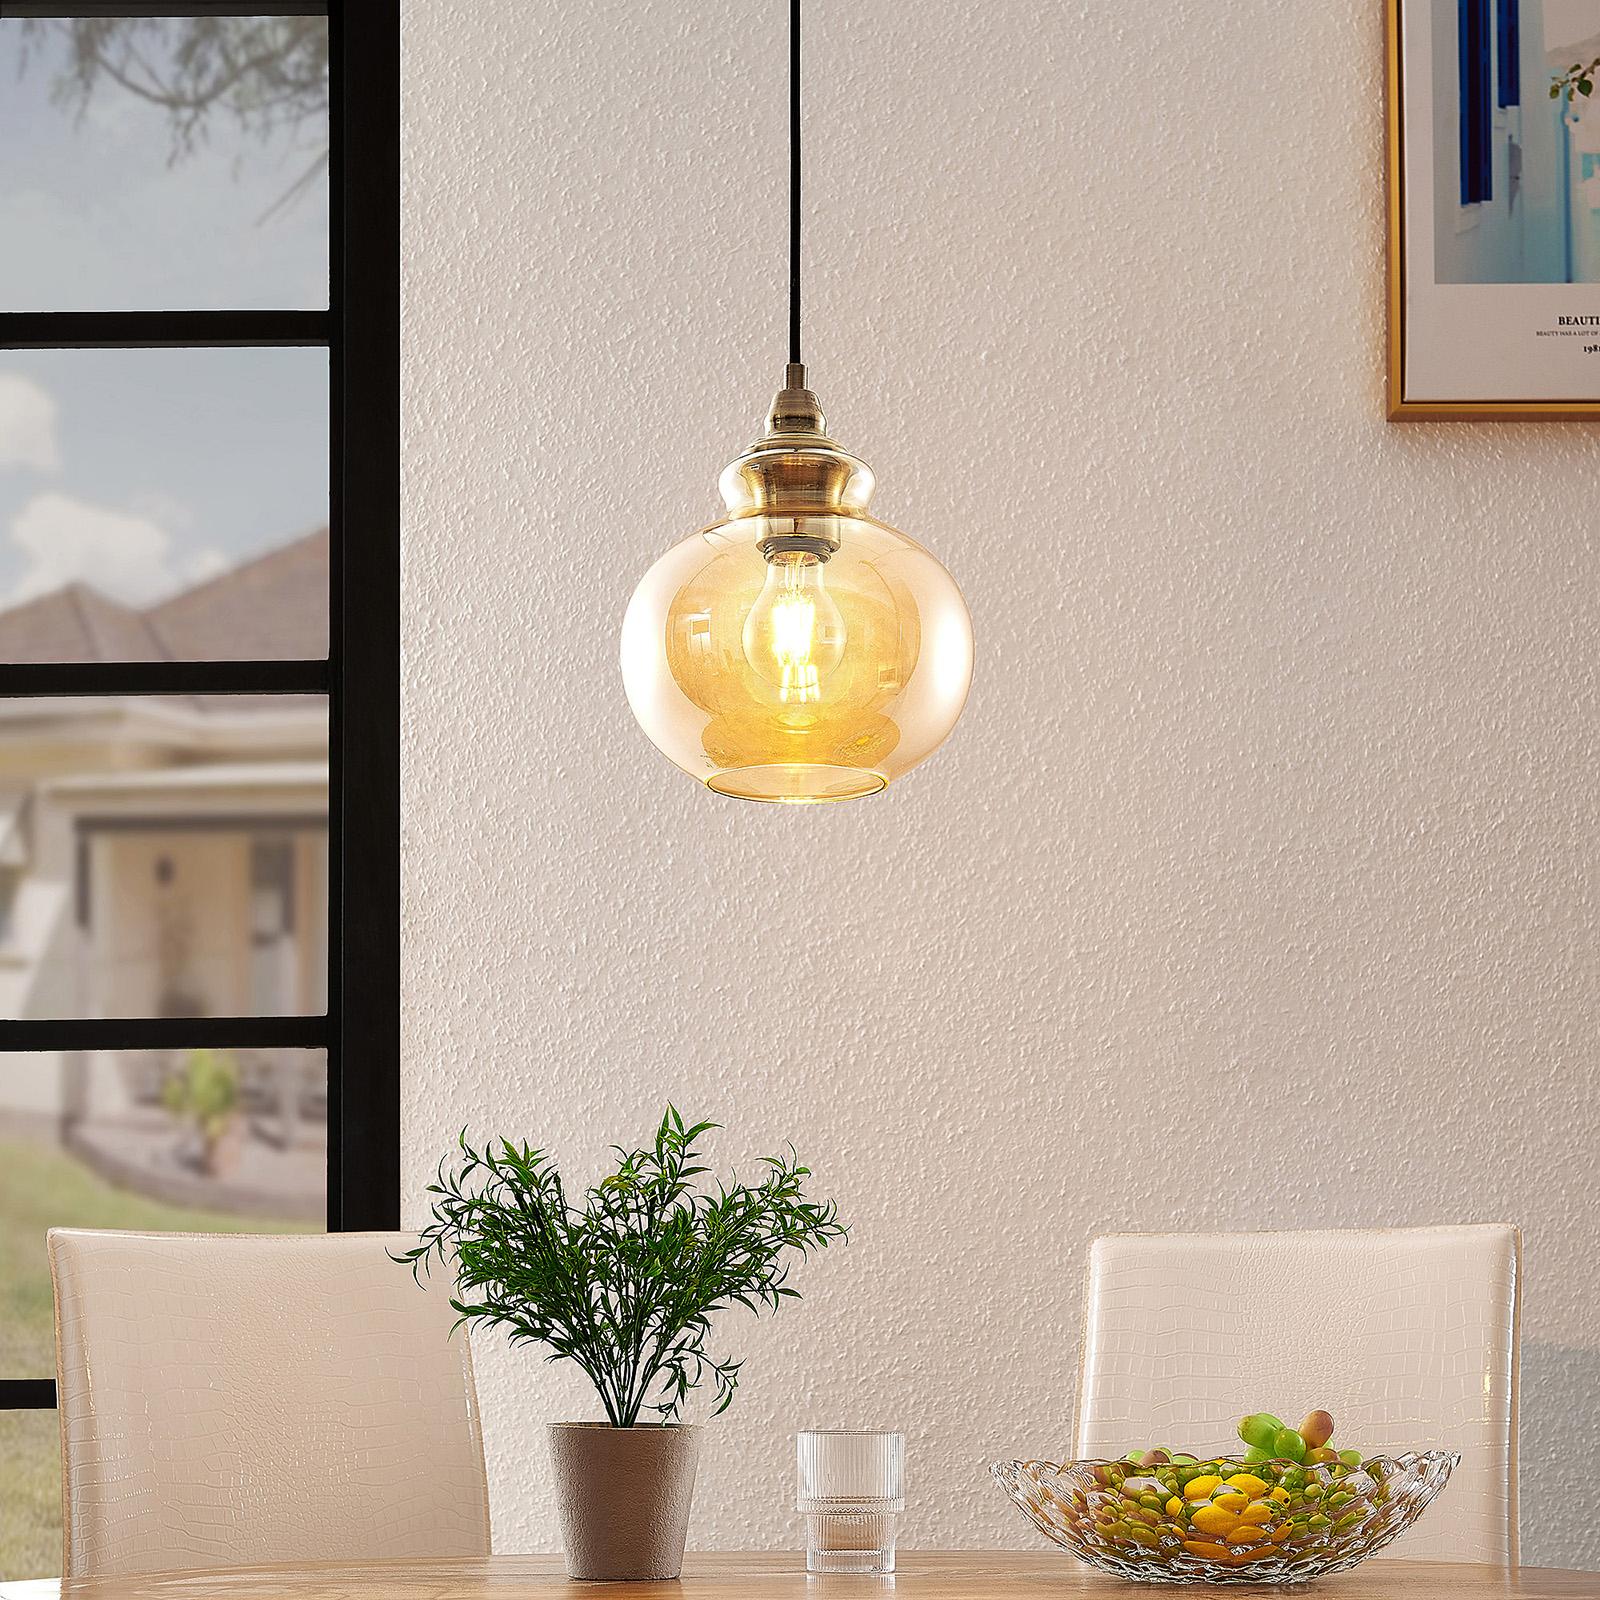 Lindby Tymoni glas-pendellampa, bärnsten, 1 lampa